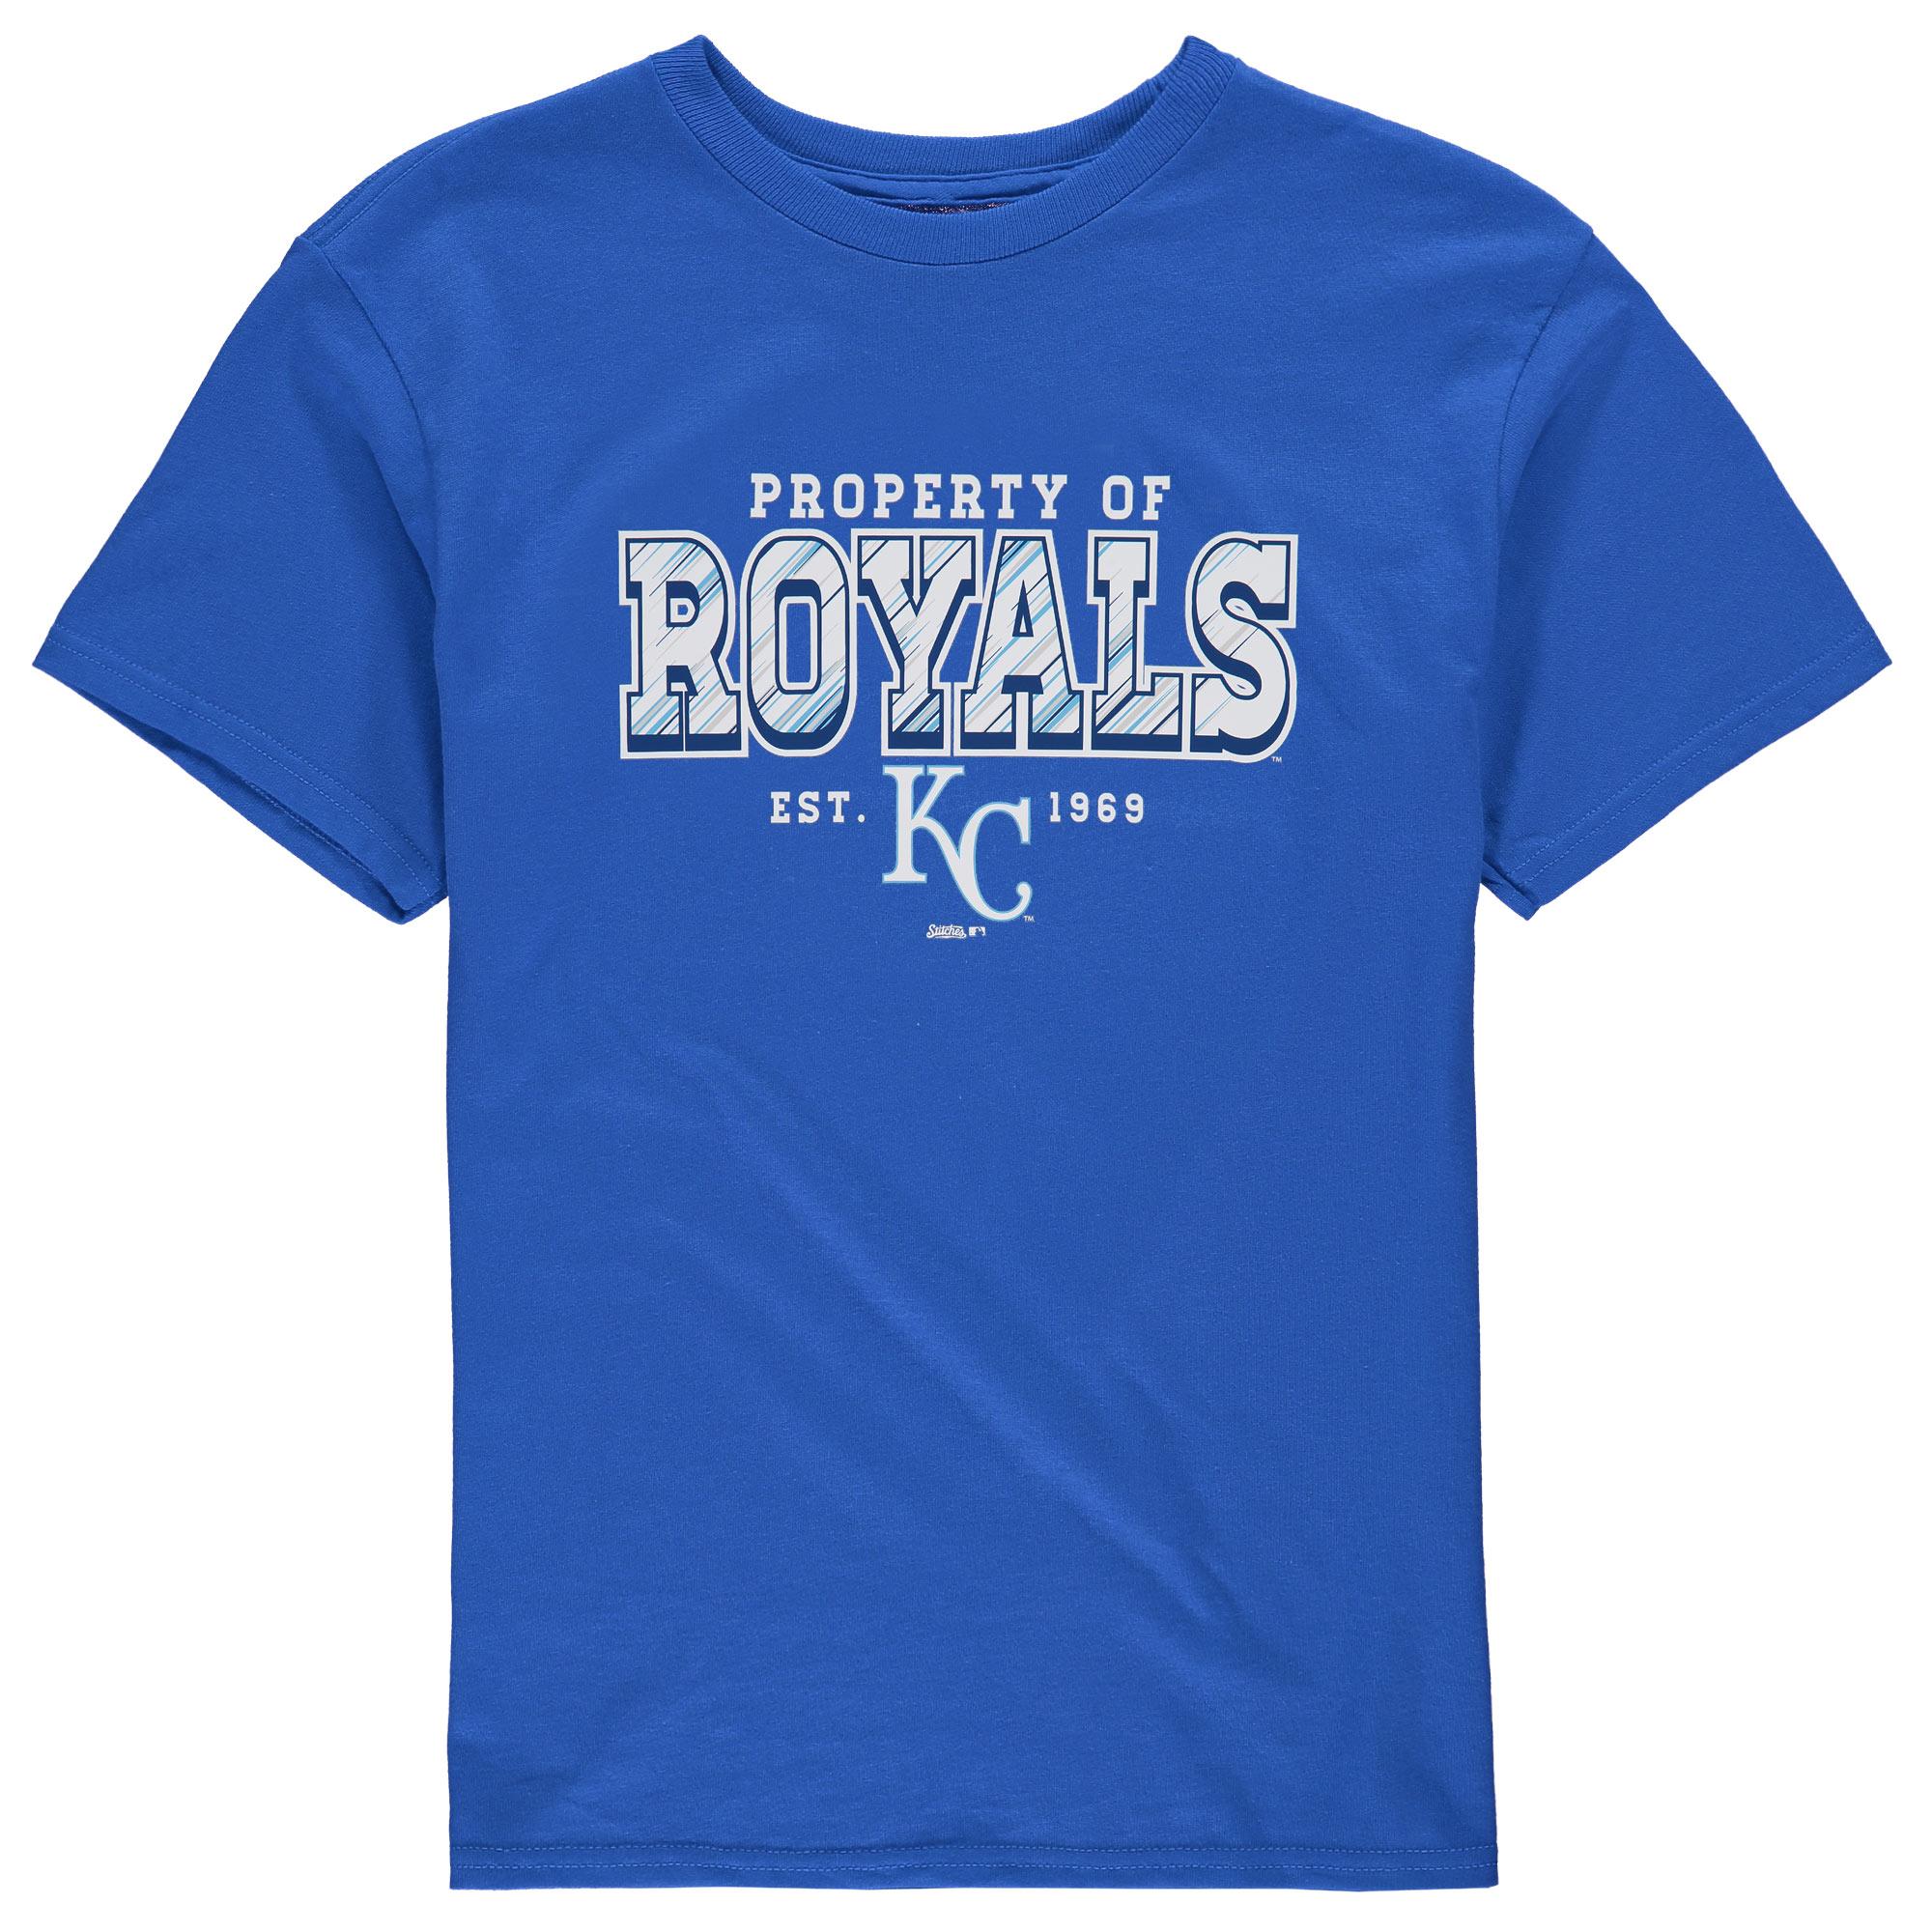 Kansas City Royals Stitches Youth Property Of Team T-Shirt - Royal